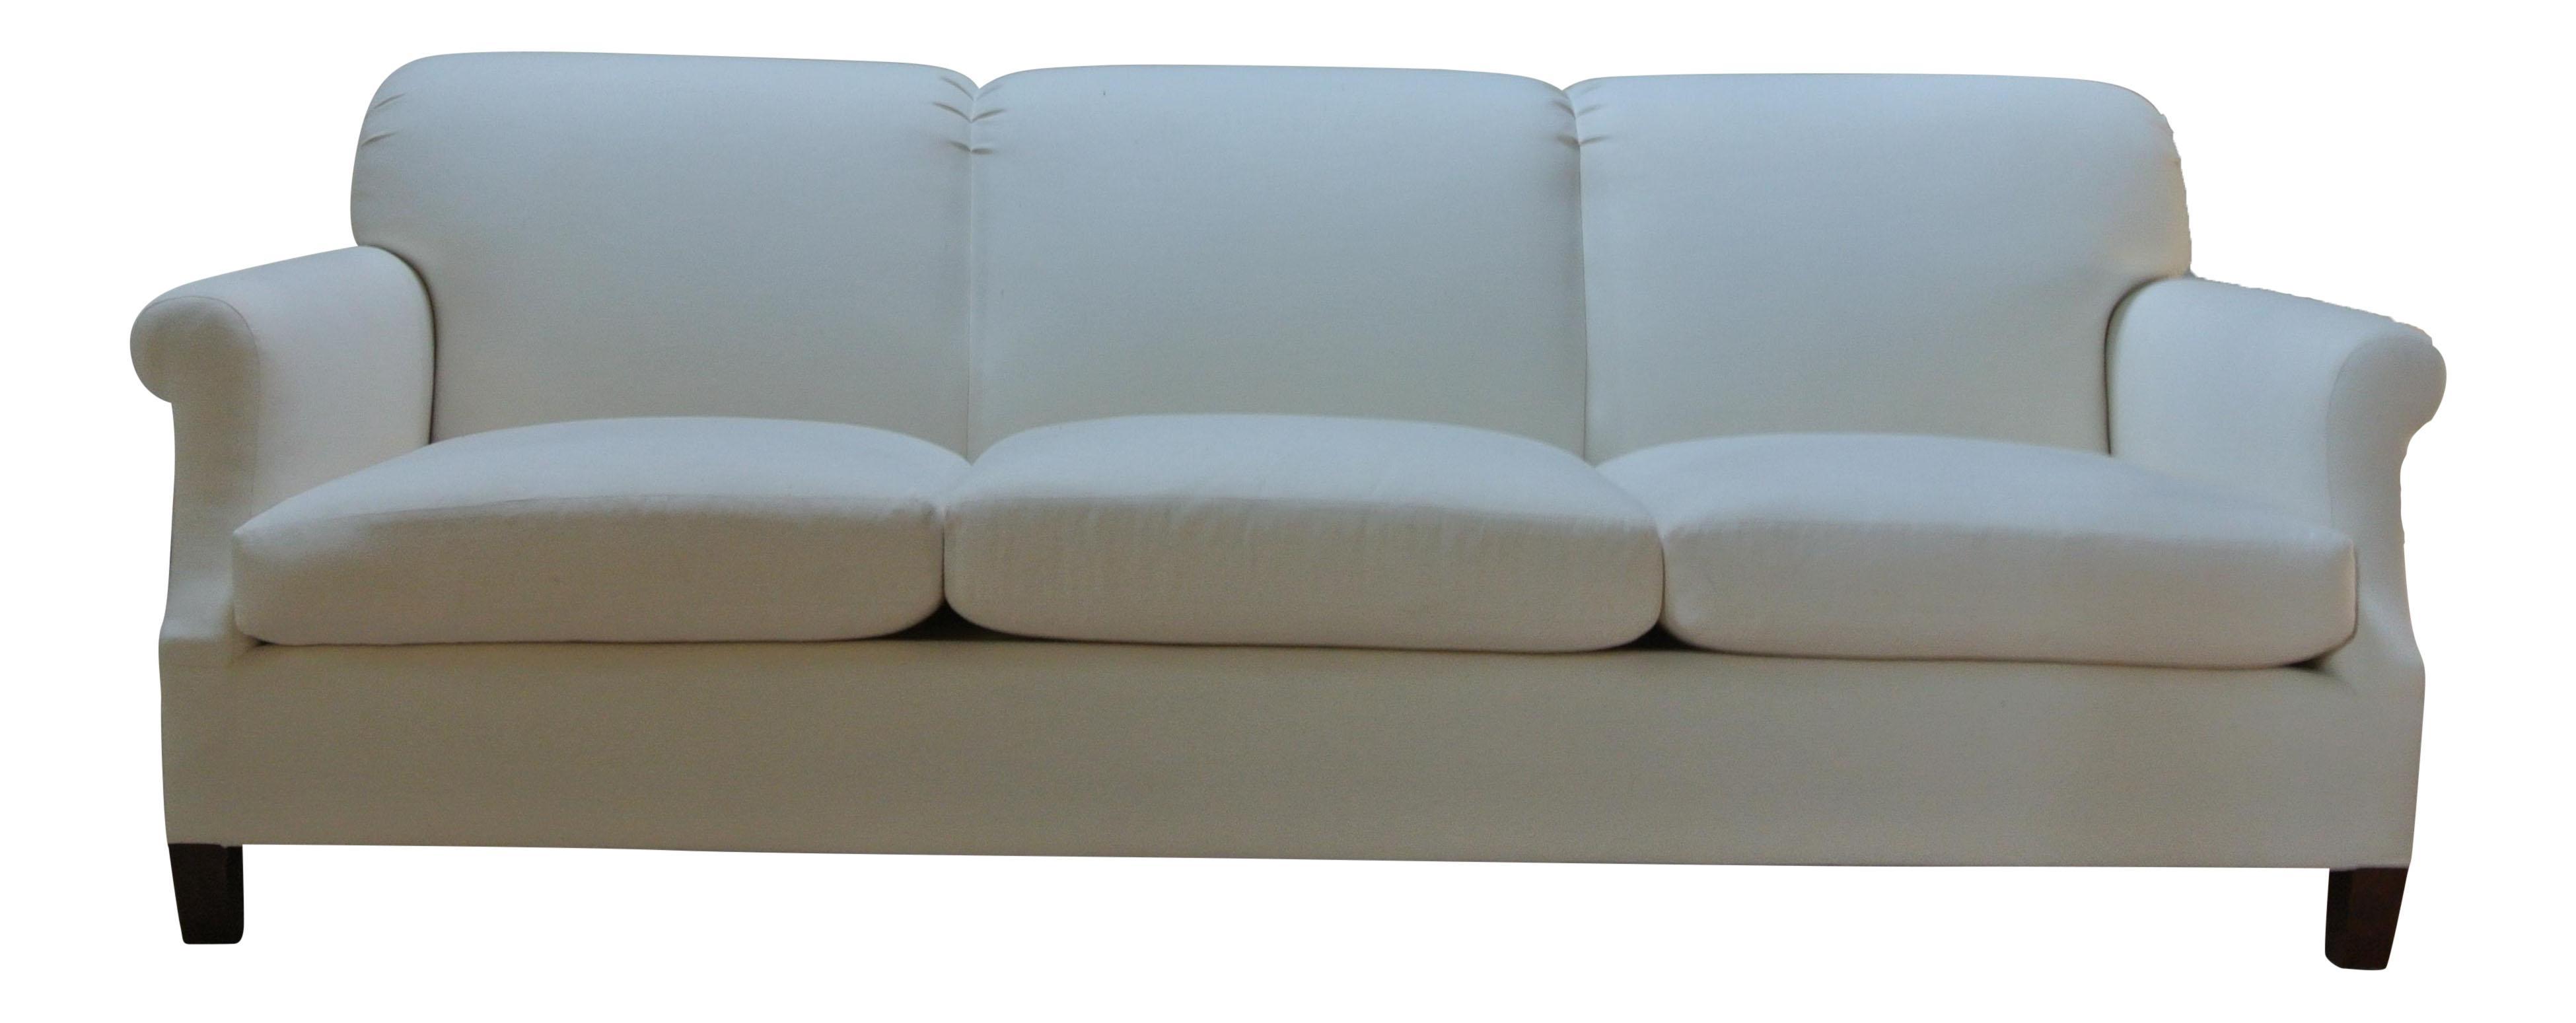 Addison Interiors Muslin Sofa   Image 5 Of 5